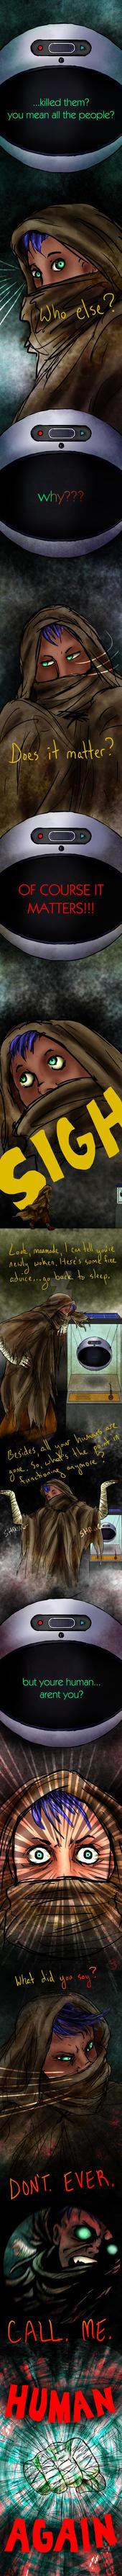 Memorbal: Page 2 - Not Human